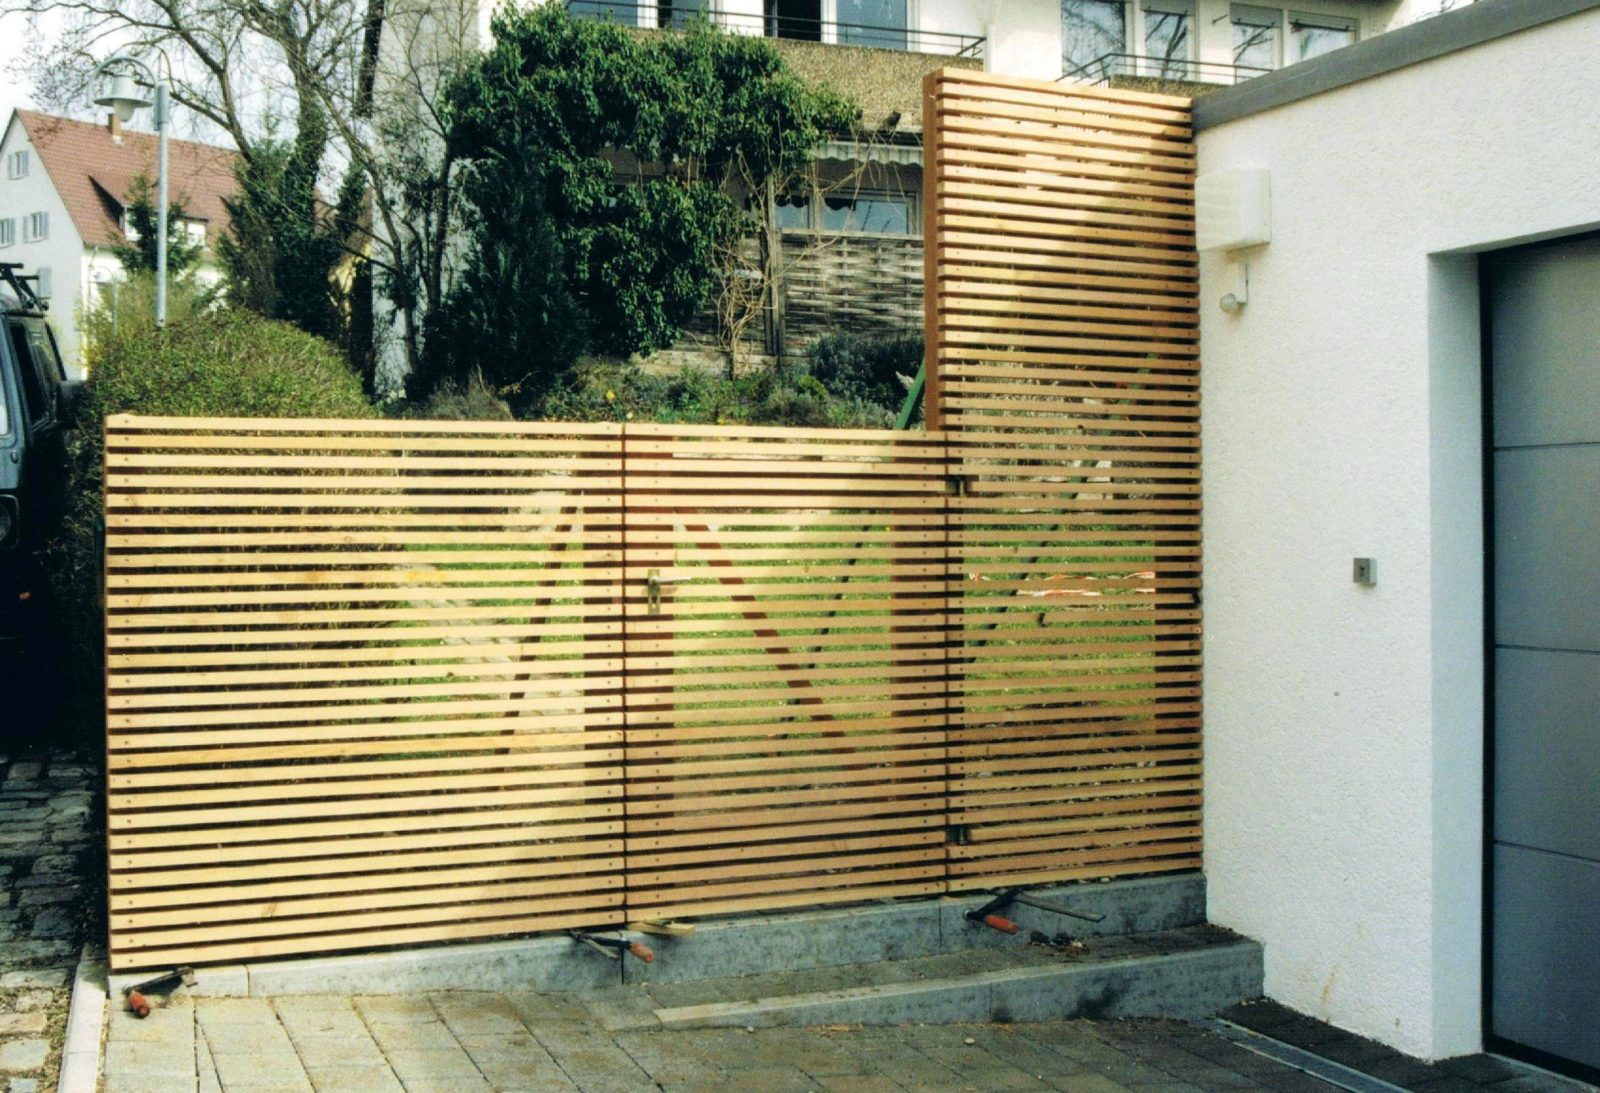 Hoftor Selber Bauen Gartentor Metall Anleitung Edelstahl Tor von Gartentor Aus Holz Bauen Photo